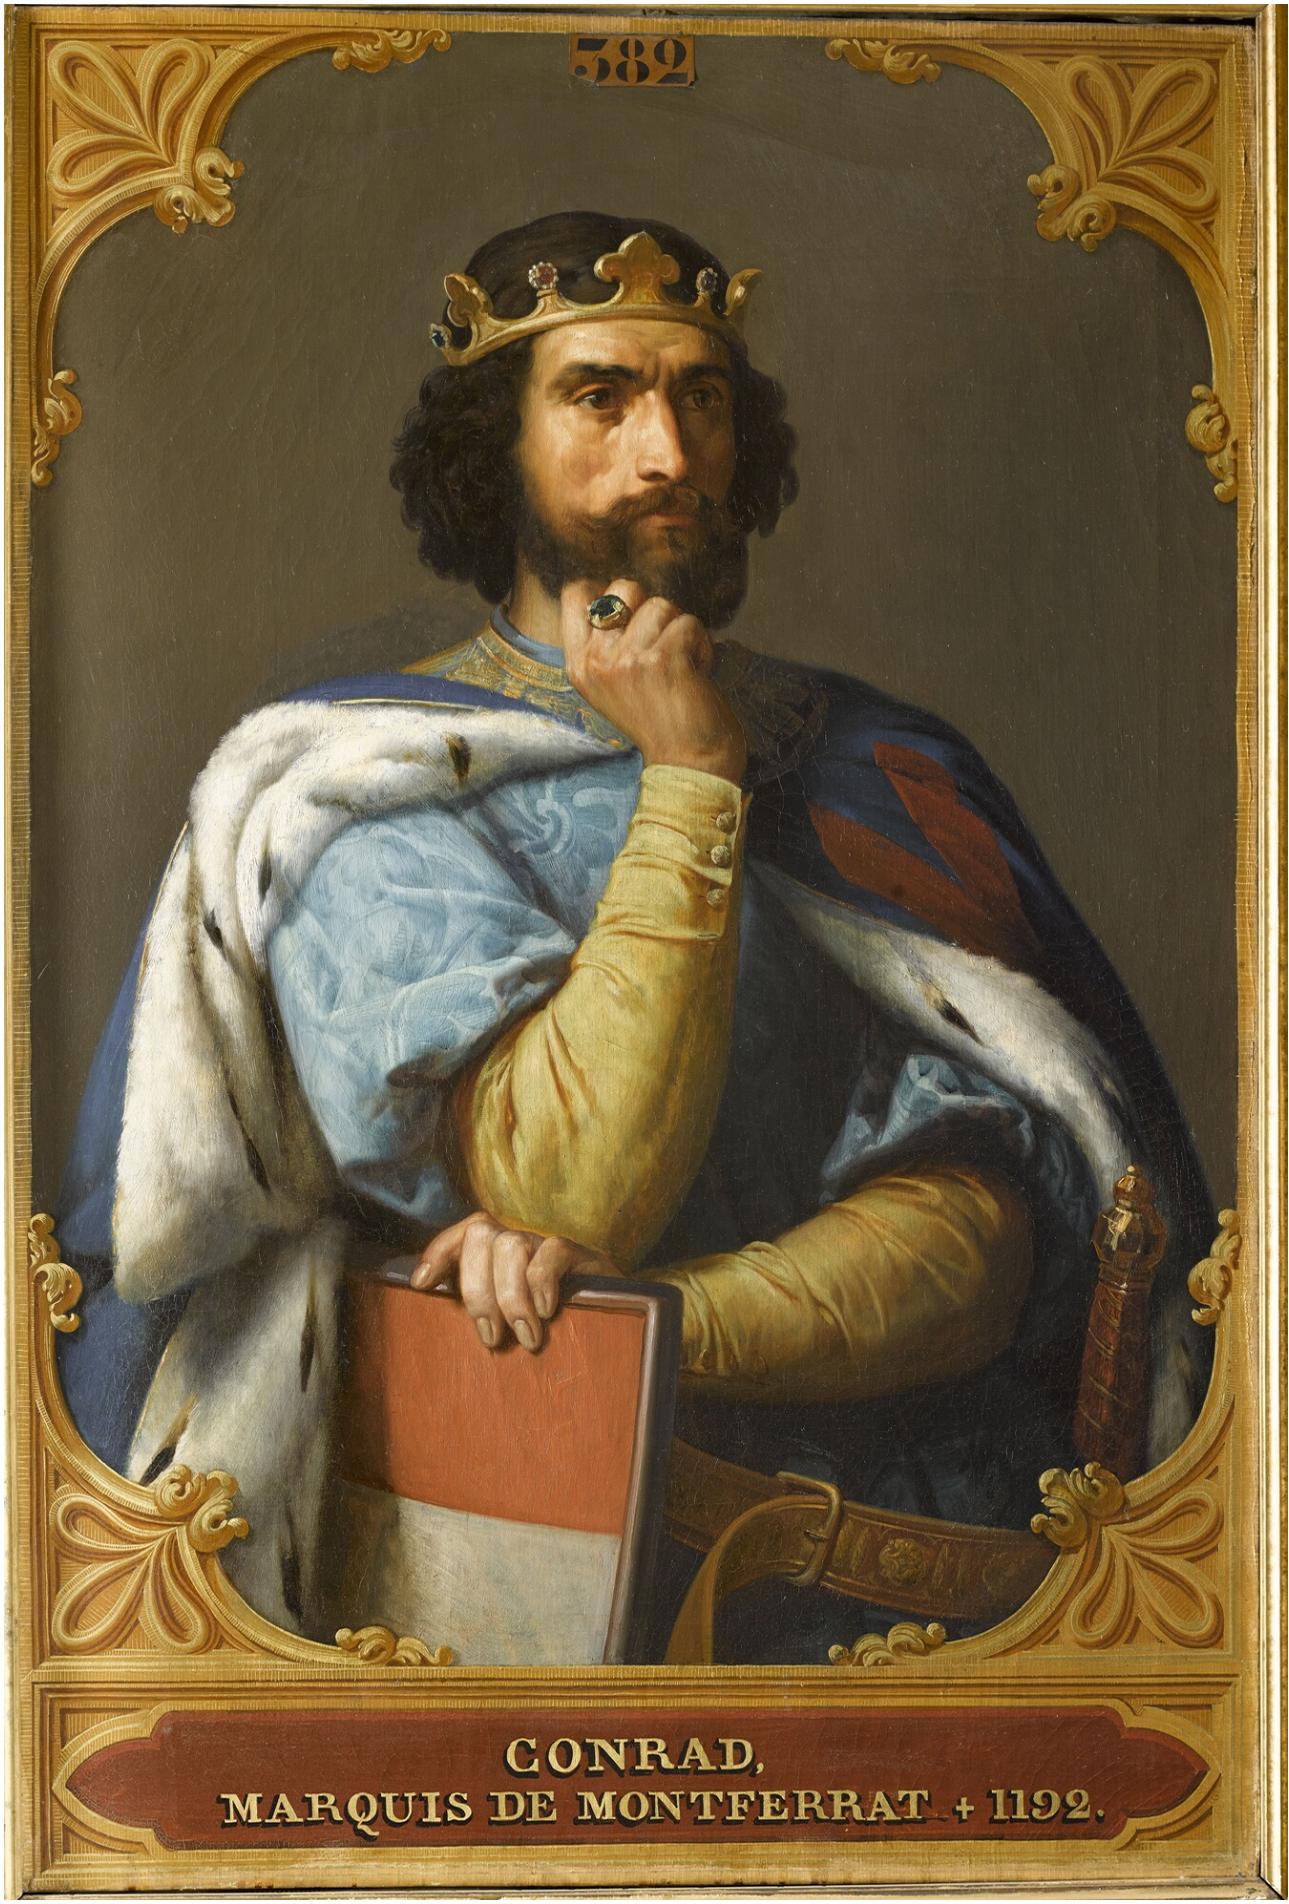 https://i2.wp.com/upload.wikimedia.org/wikipedia/commons/1/1d/Conrad-Picot.jpg